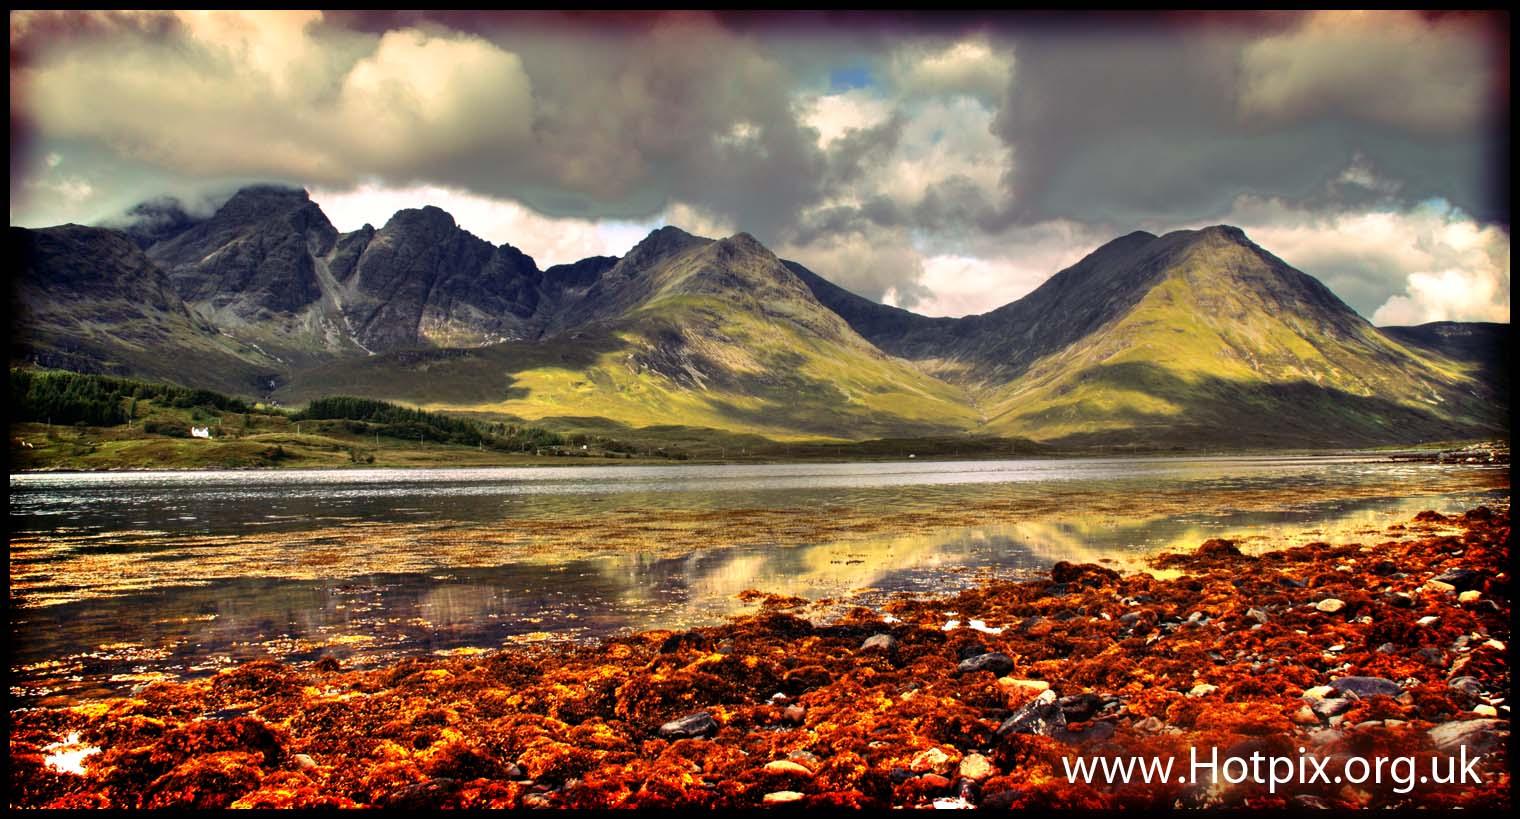 Scotland,skye,isle,island,Torins,Torin,walk,walking,UK,islands,mountains,hills,corbet,corbets,seaweed,brown,reflections,reflect,Torrin,HDR